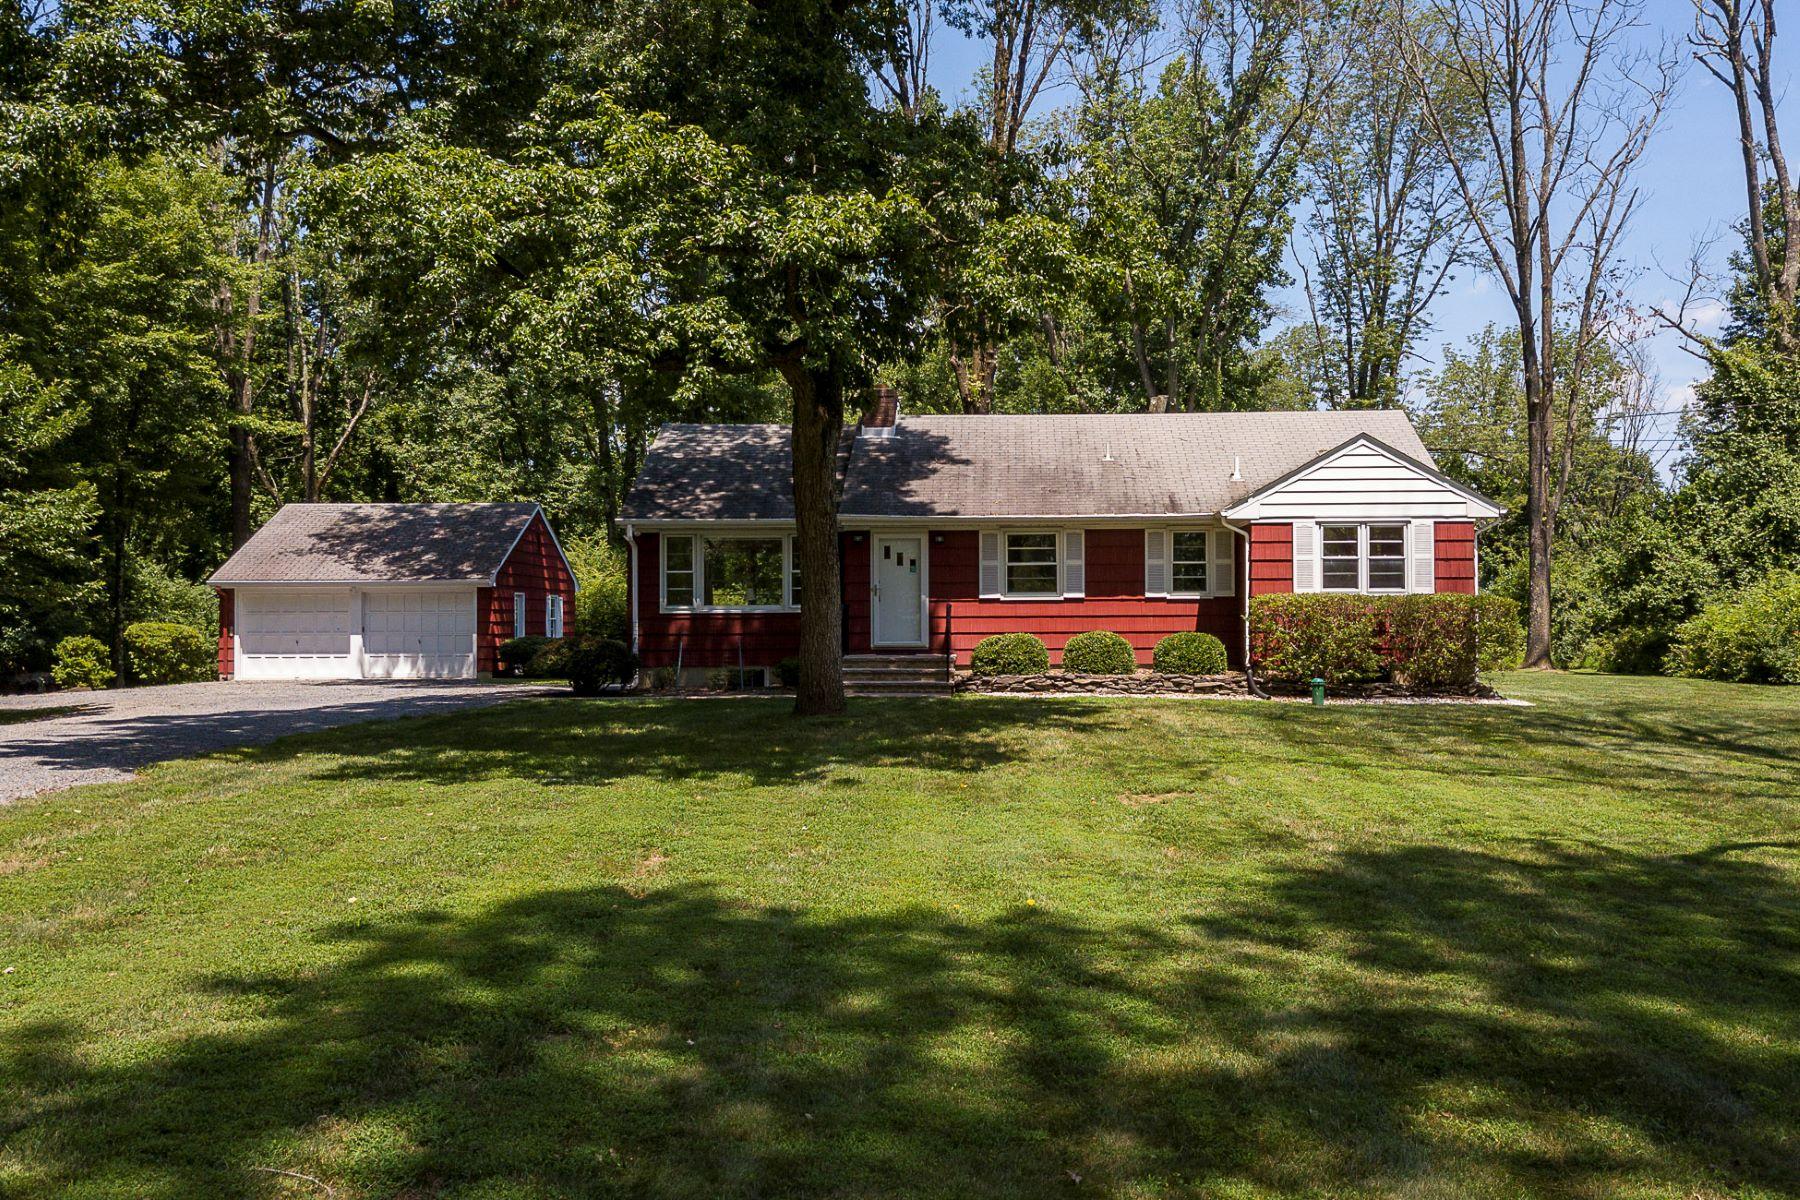 Single Family Homes για την Πώληση στο Enjoy, Expand, Build New - Endless Possibilities 265 Herrontown Road, Princeton, Νιου Τζερσεϋ 08540 Ηνωμένες Πολιτείες